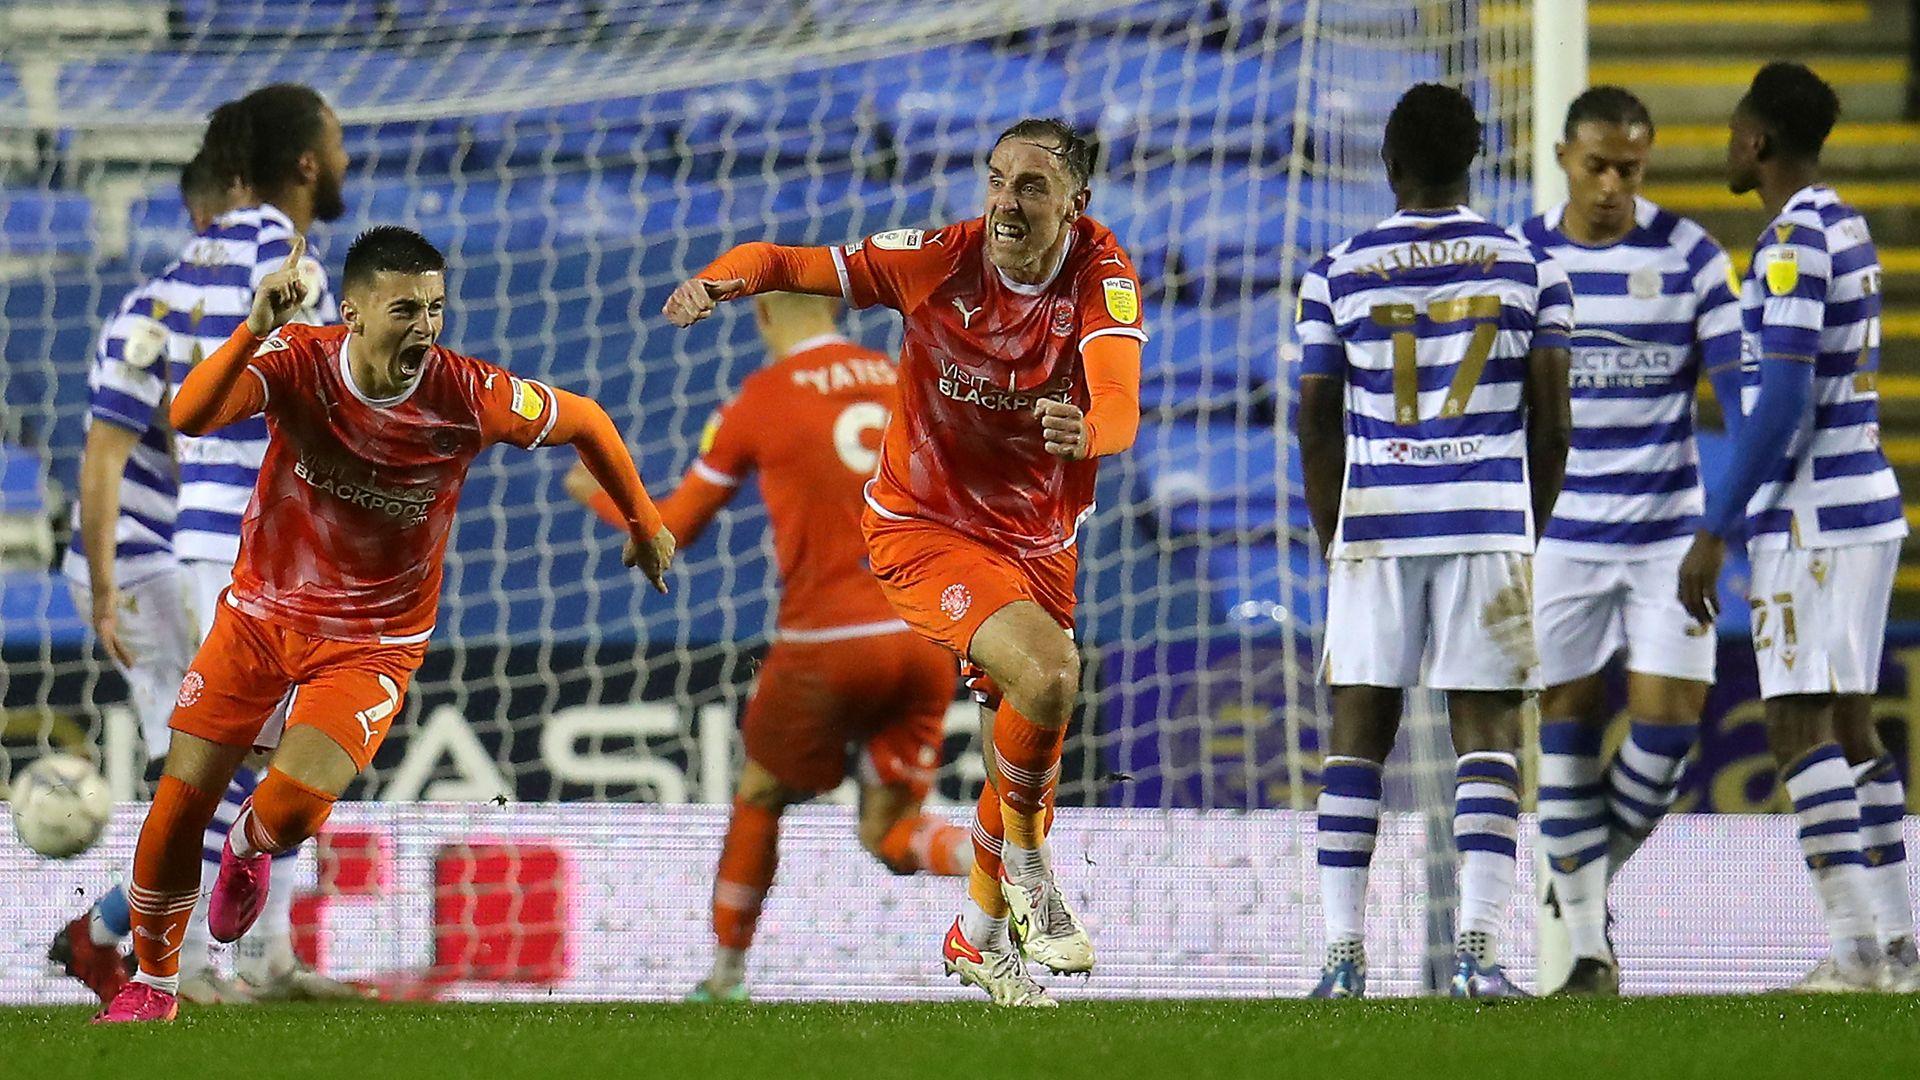 Blackpool battle back to stun Reading